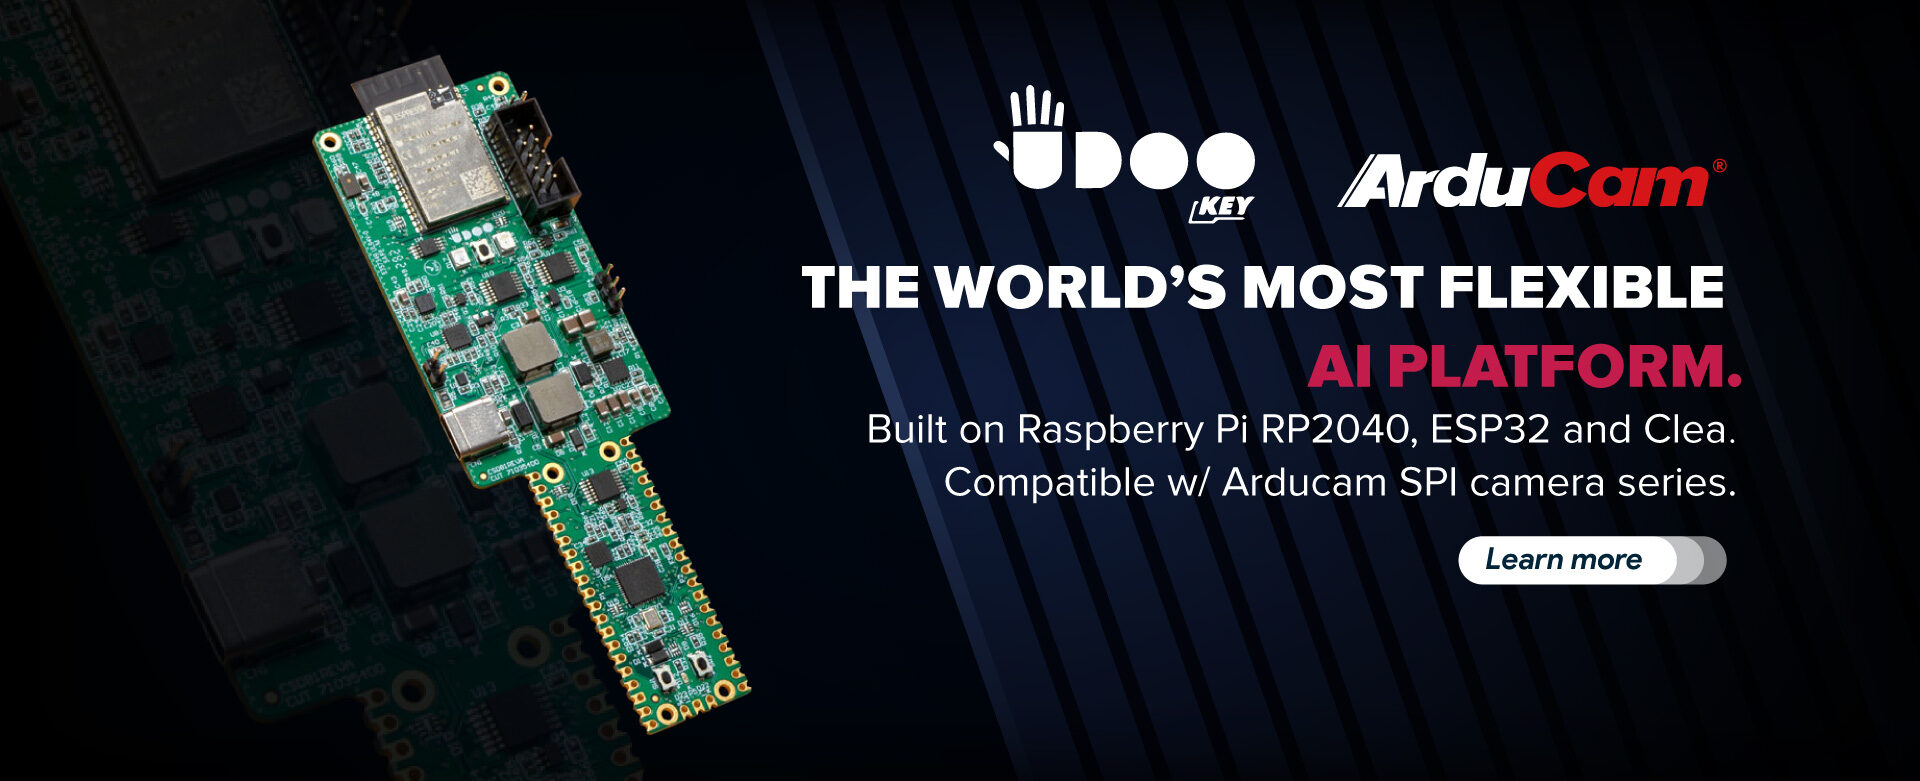 UDOO Compatible w Arducam SPI camera series